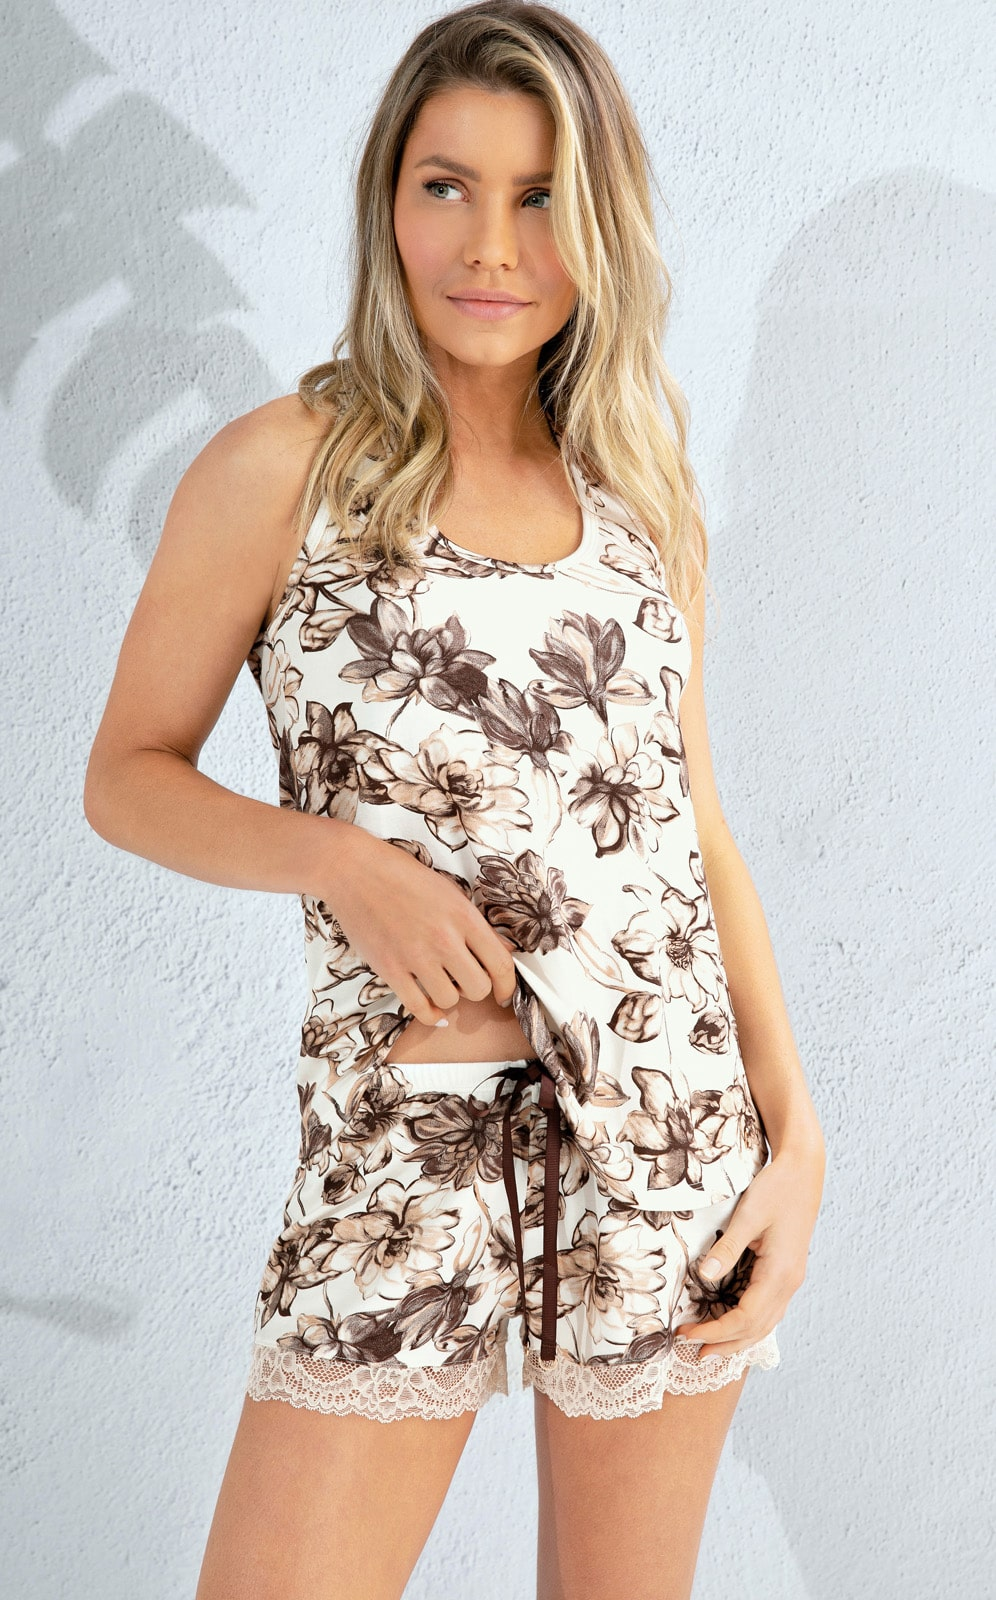 Pijama Feminino Mixte Regata com shorts Estampa Floral 1157